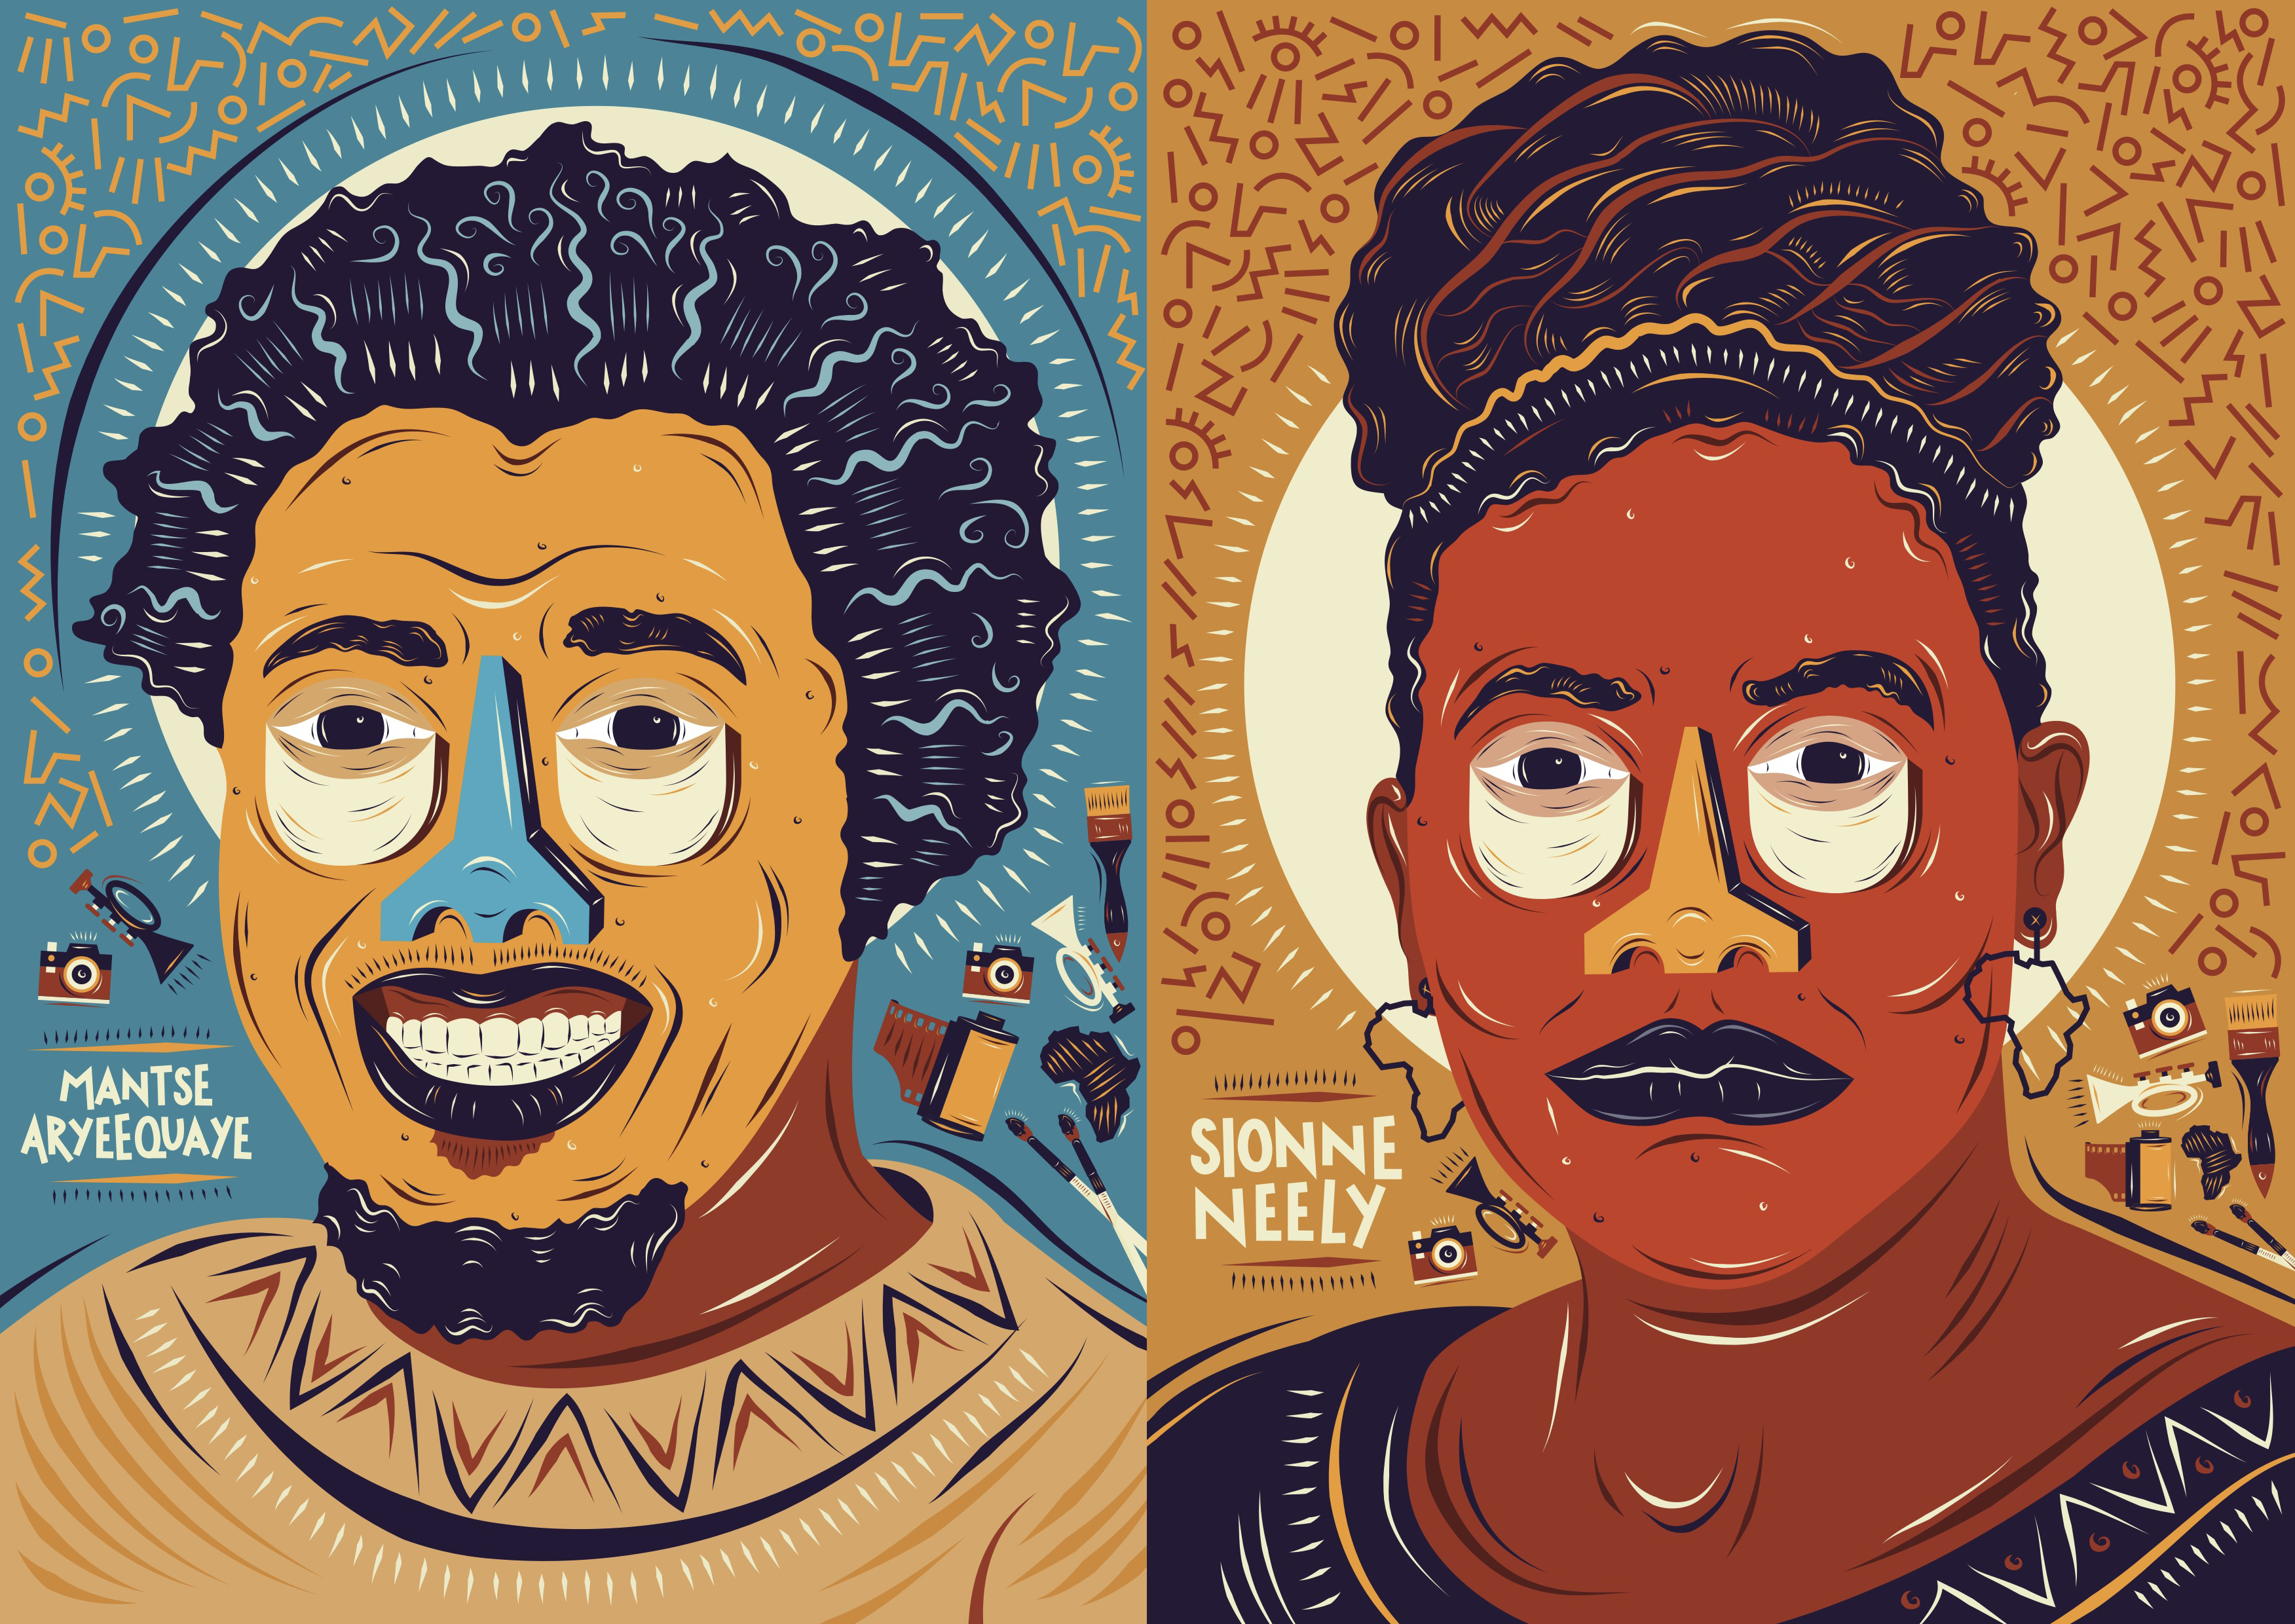 Mantse Aryeequaye and Sionne Neely (Karabo Moletsane for Quartz)